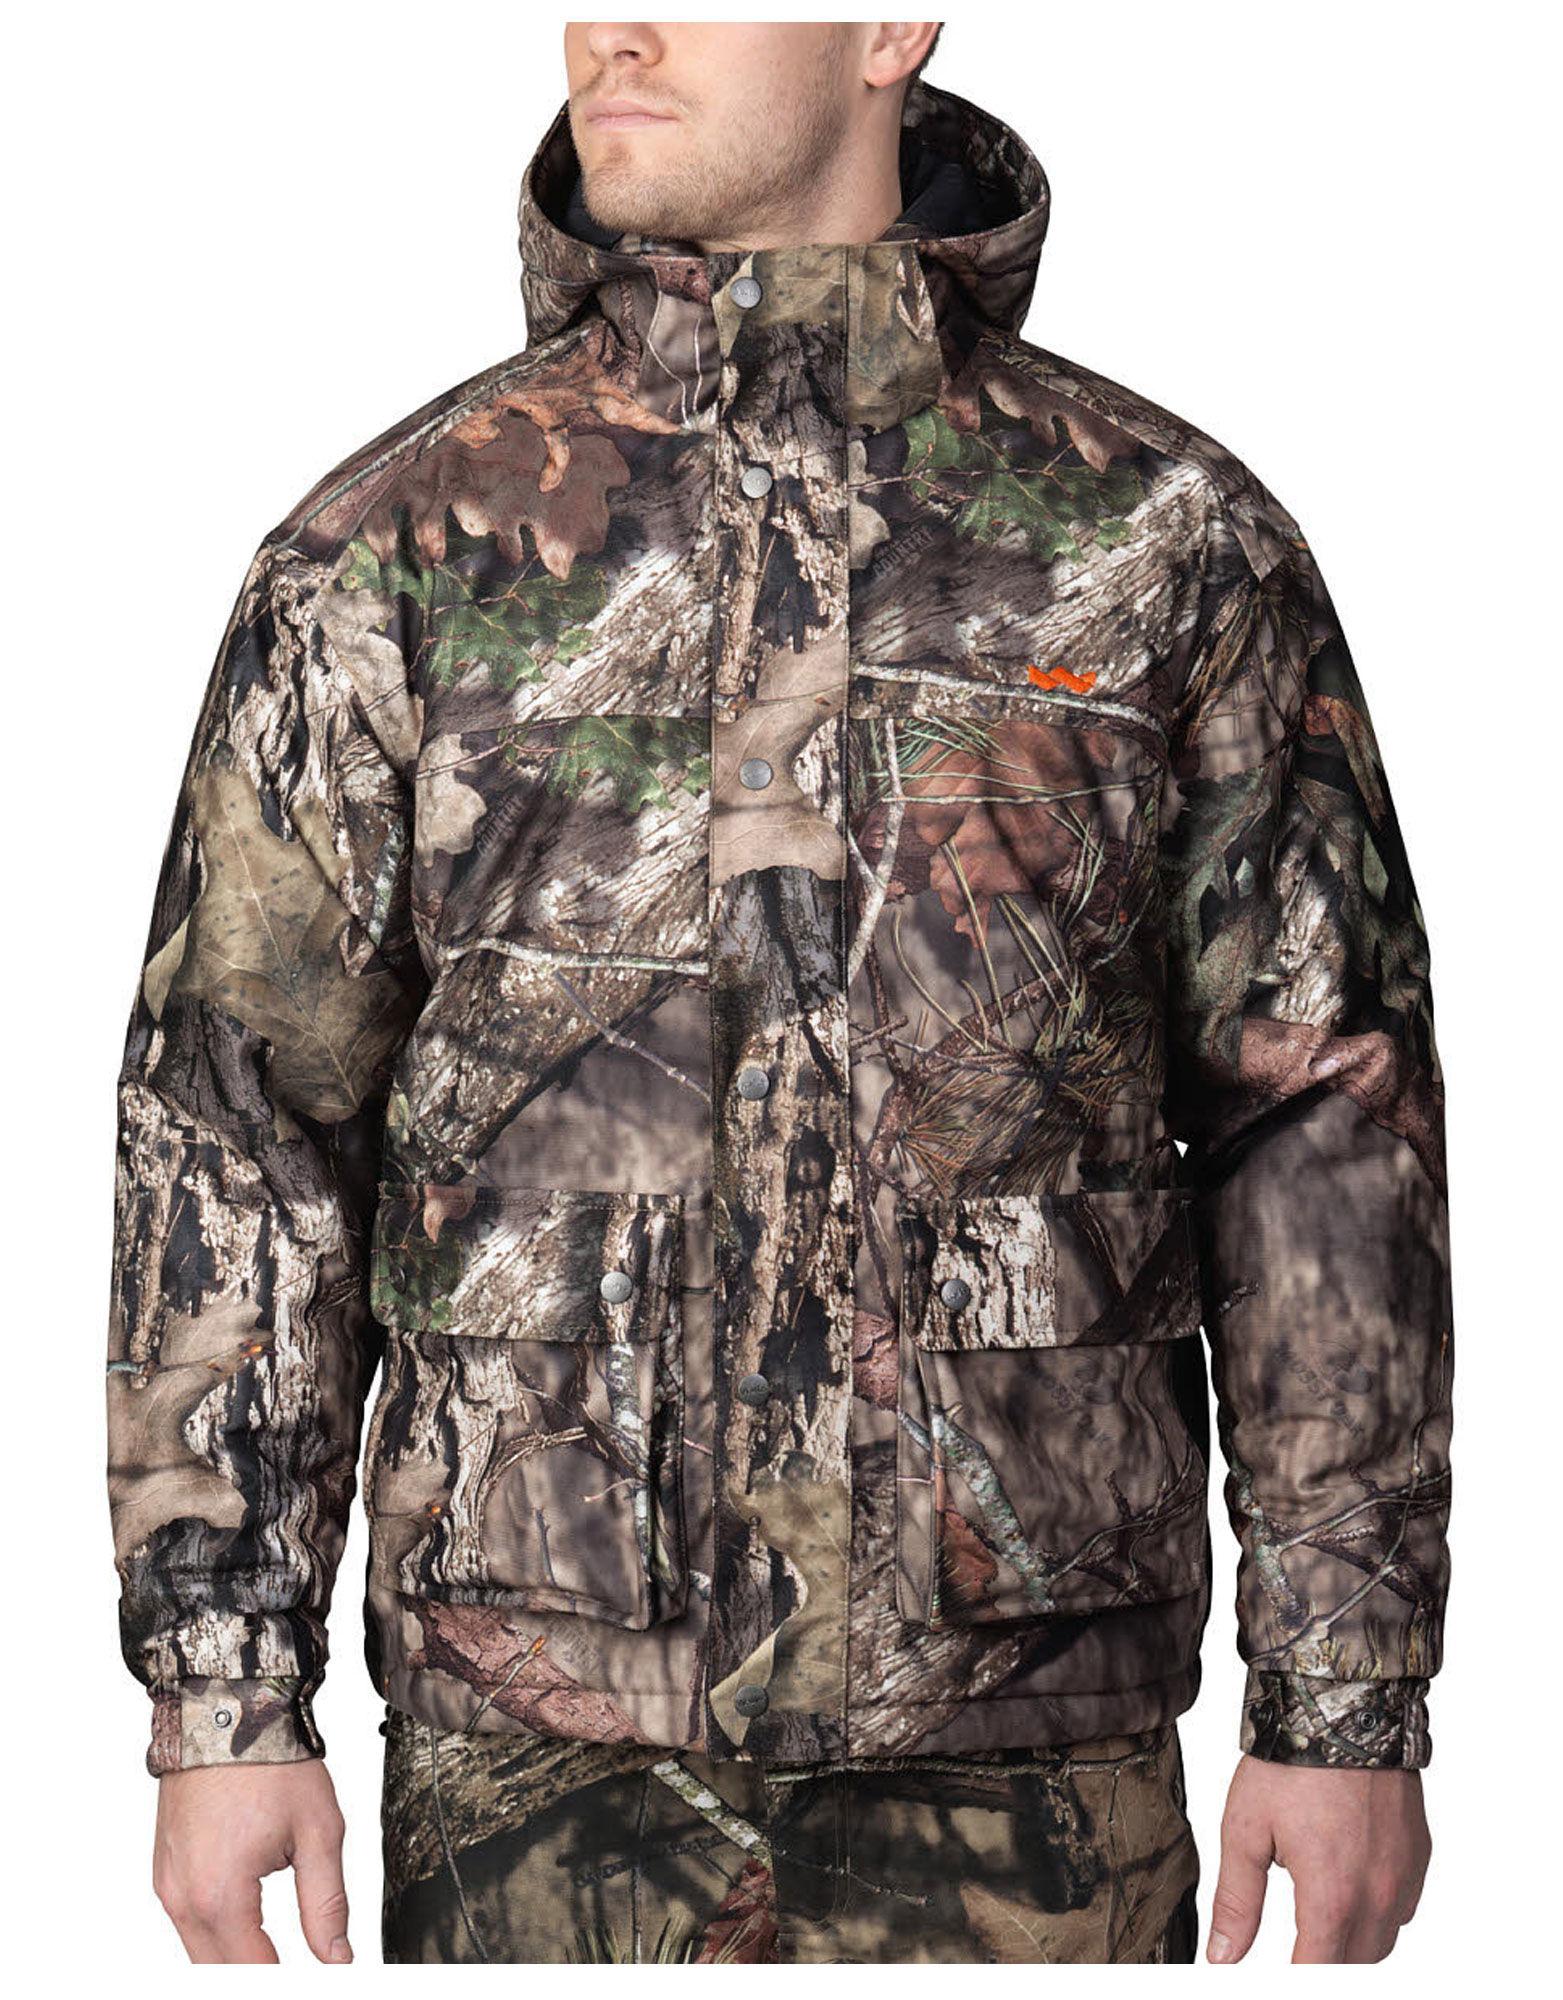 Powerbuy Ins. Jacket